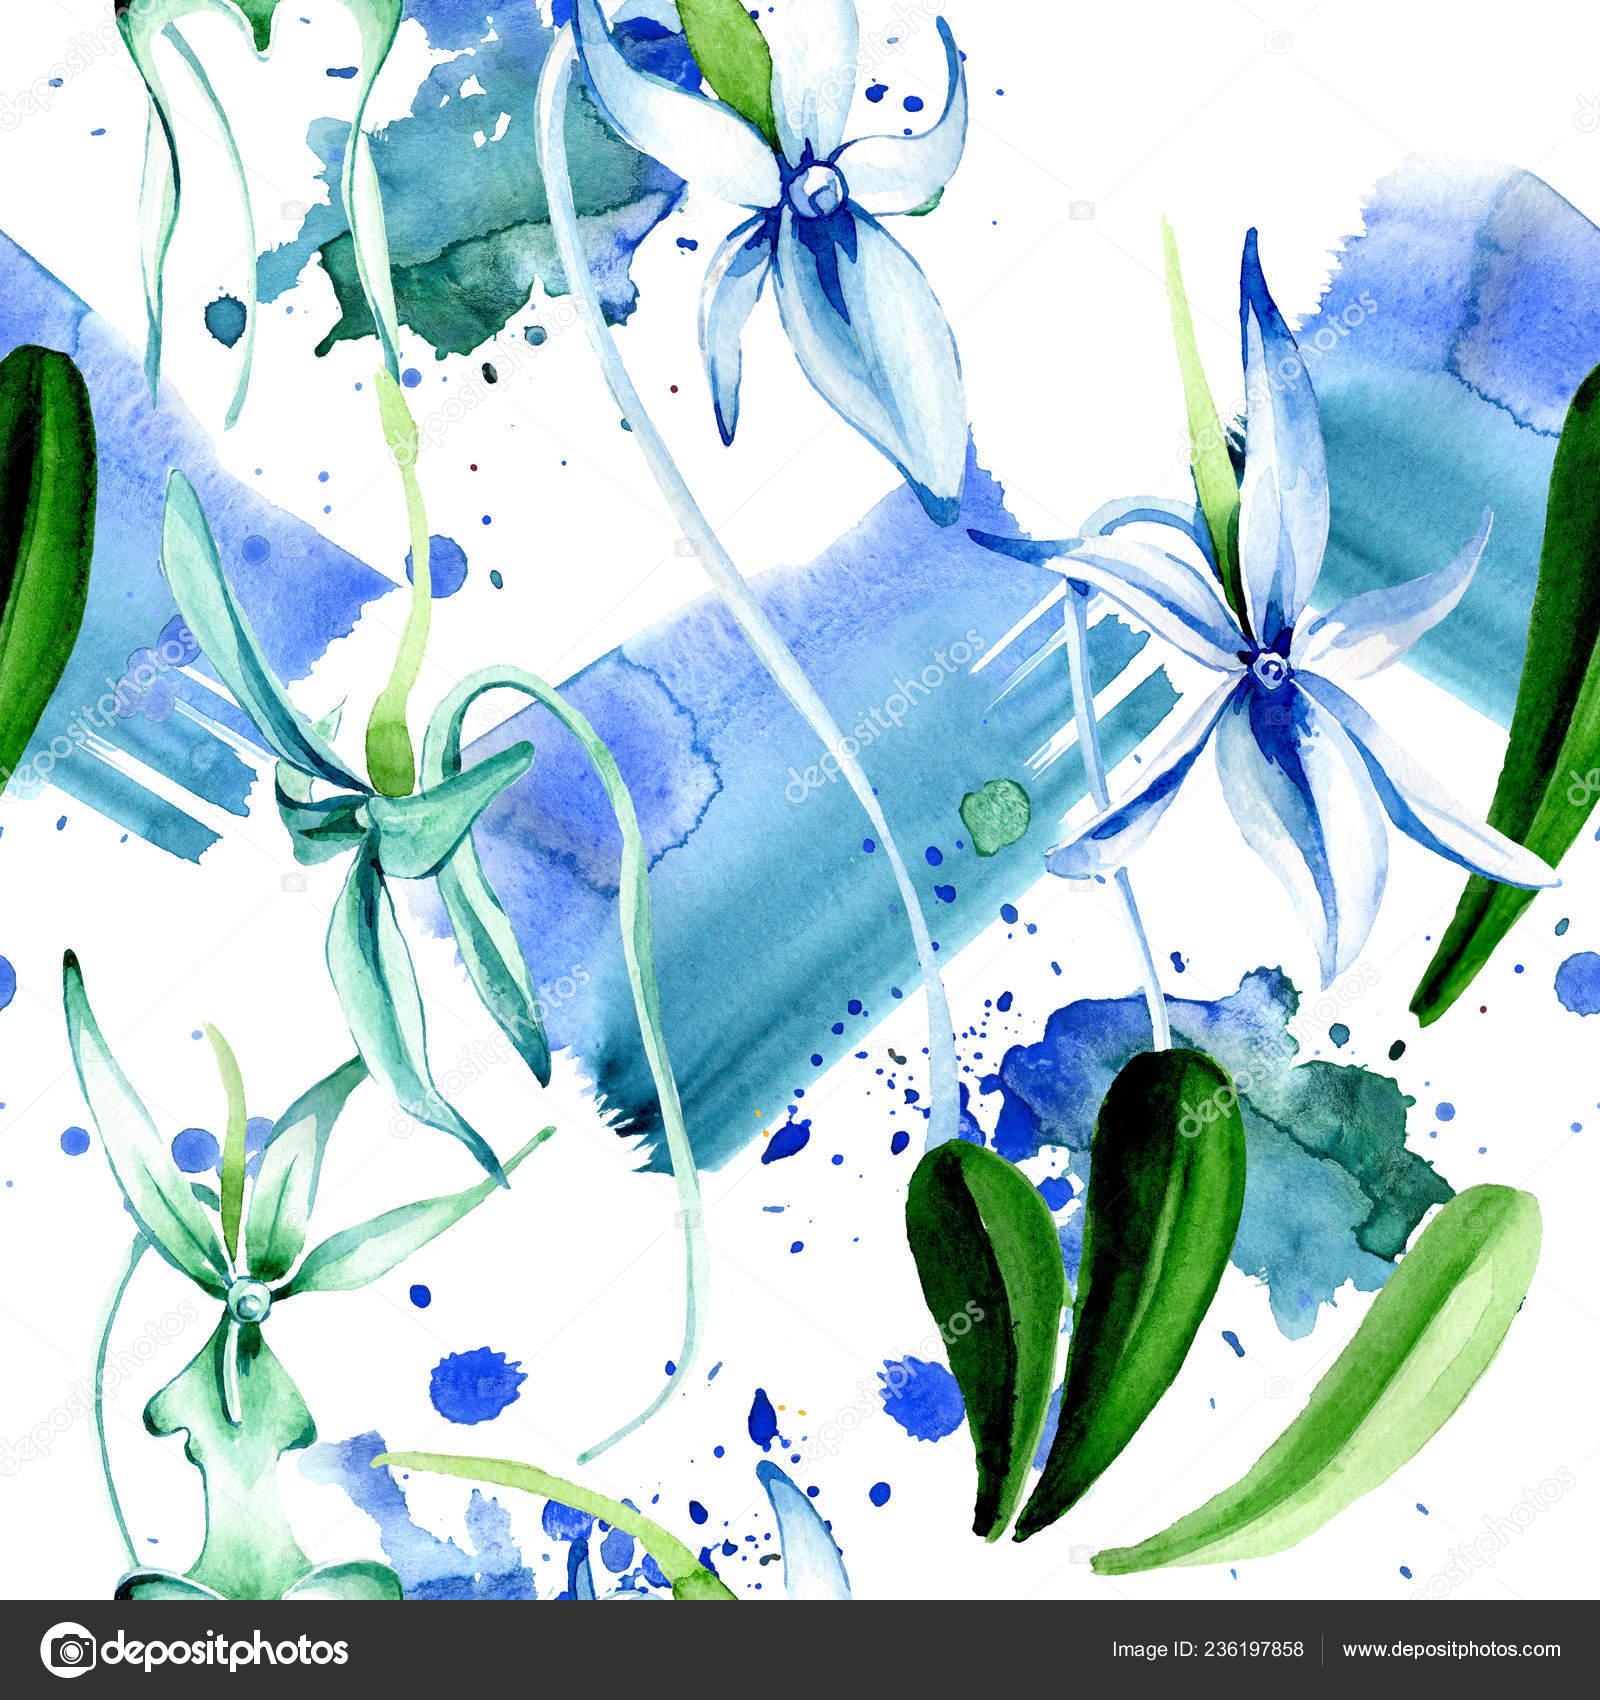 Modra Vzacne Orchideje Kvetinove Botanicke Kvetin Divoky Jarni List